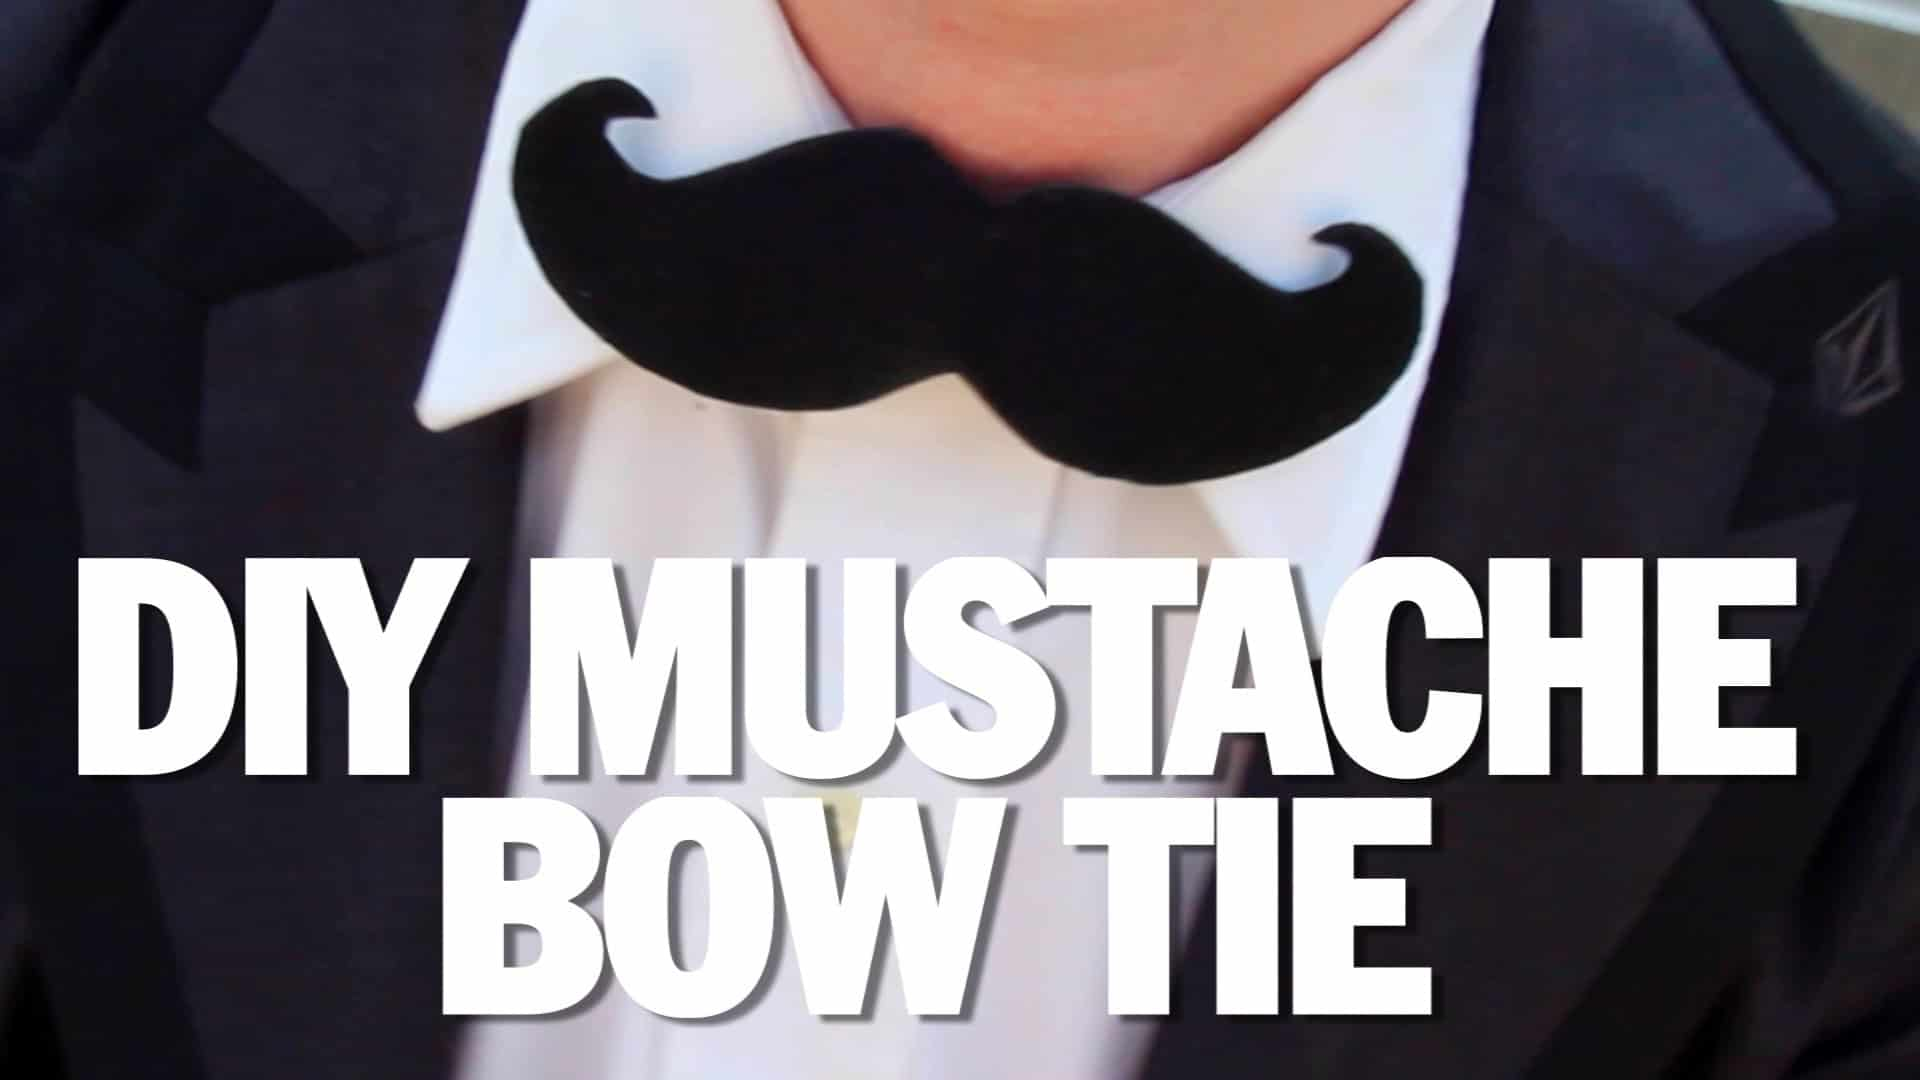 Diy moustahce bowtie